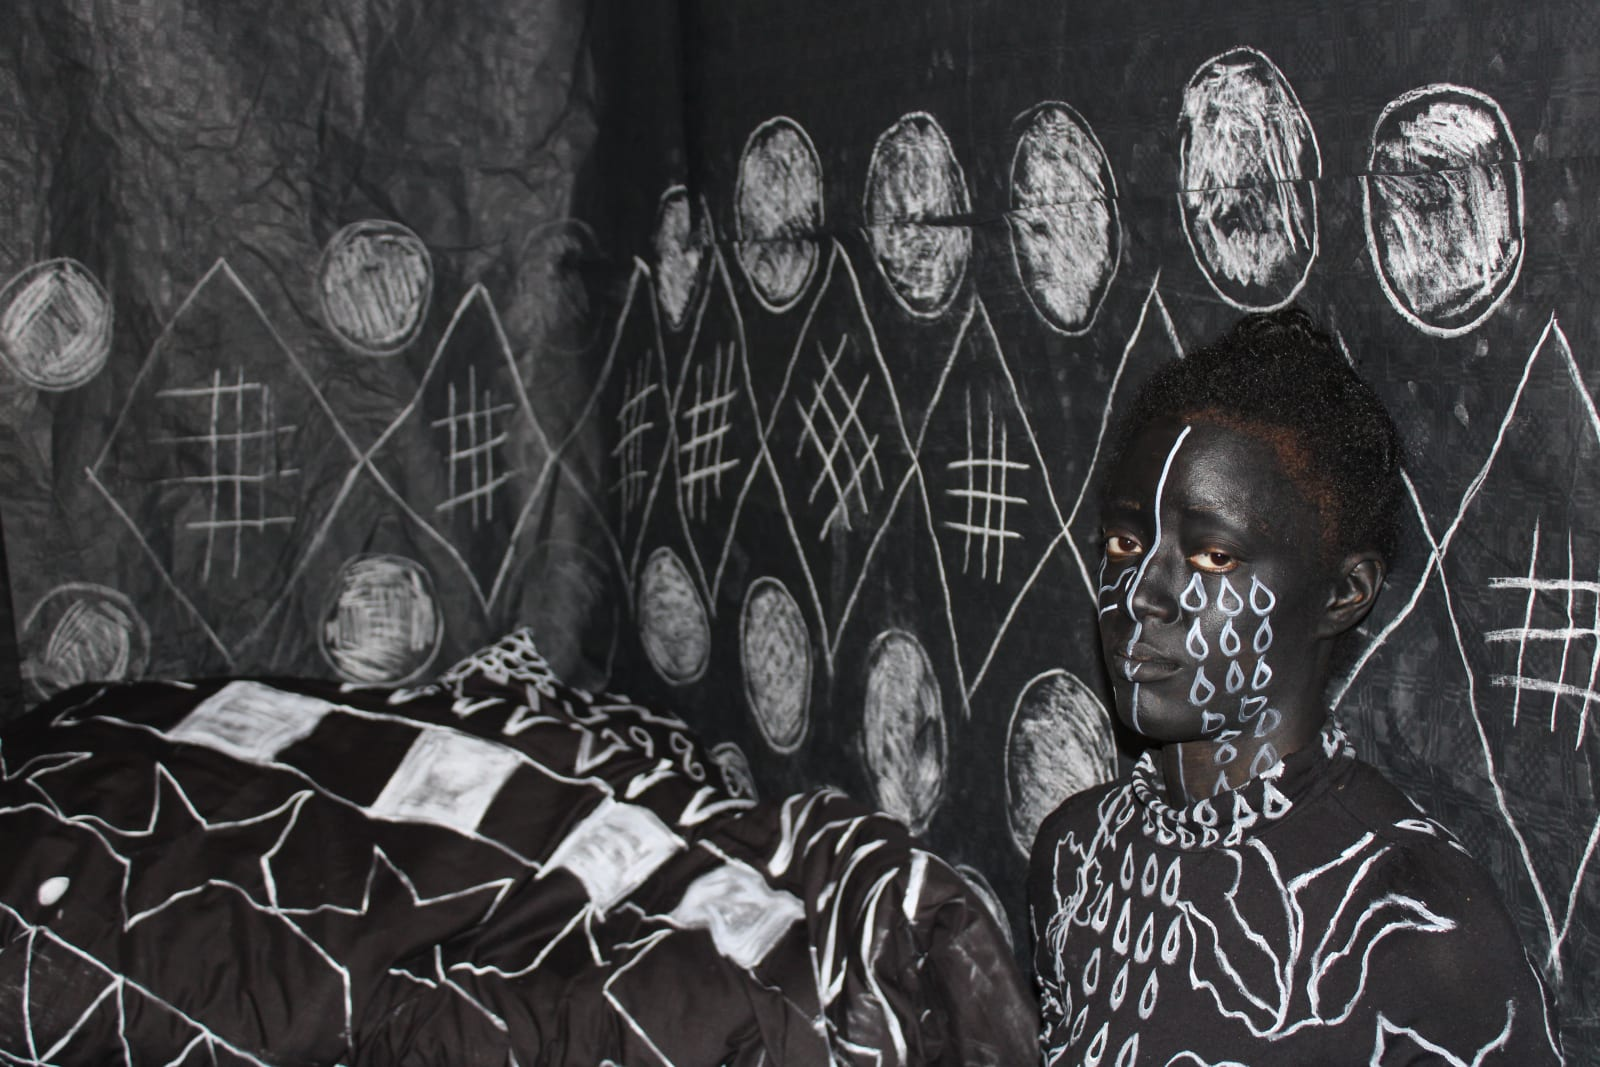 Abi Ola, Patterns in my bedroom 1